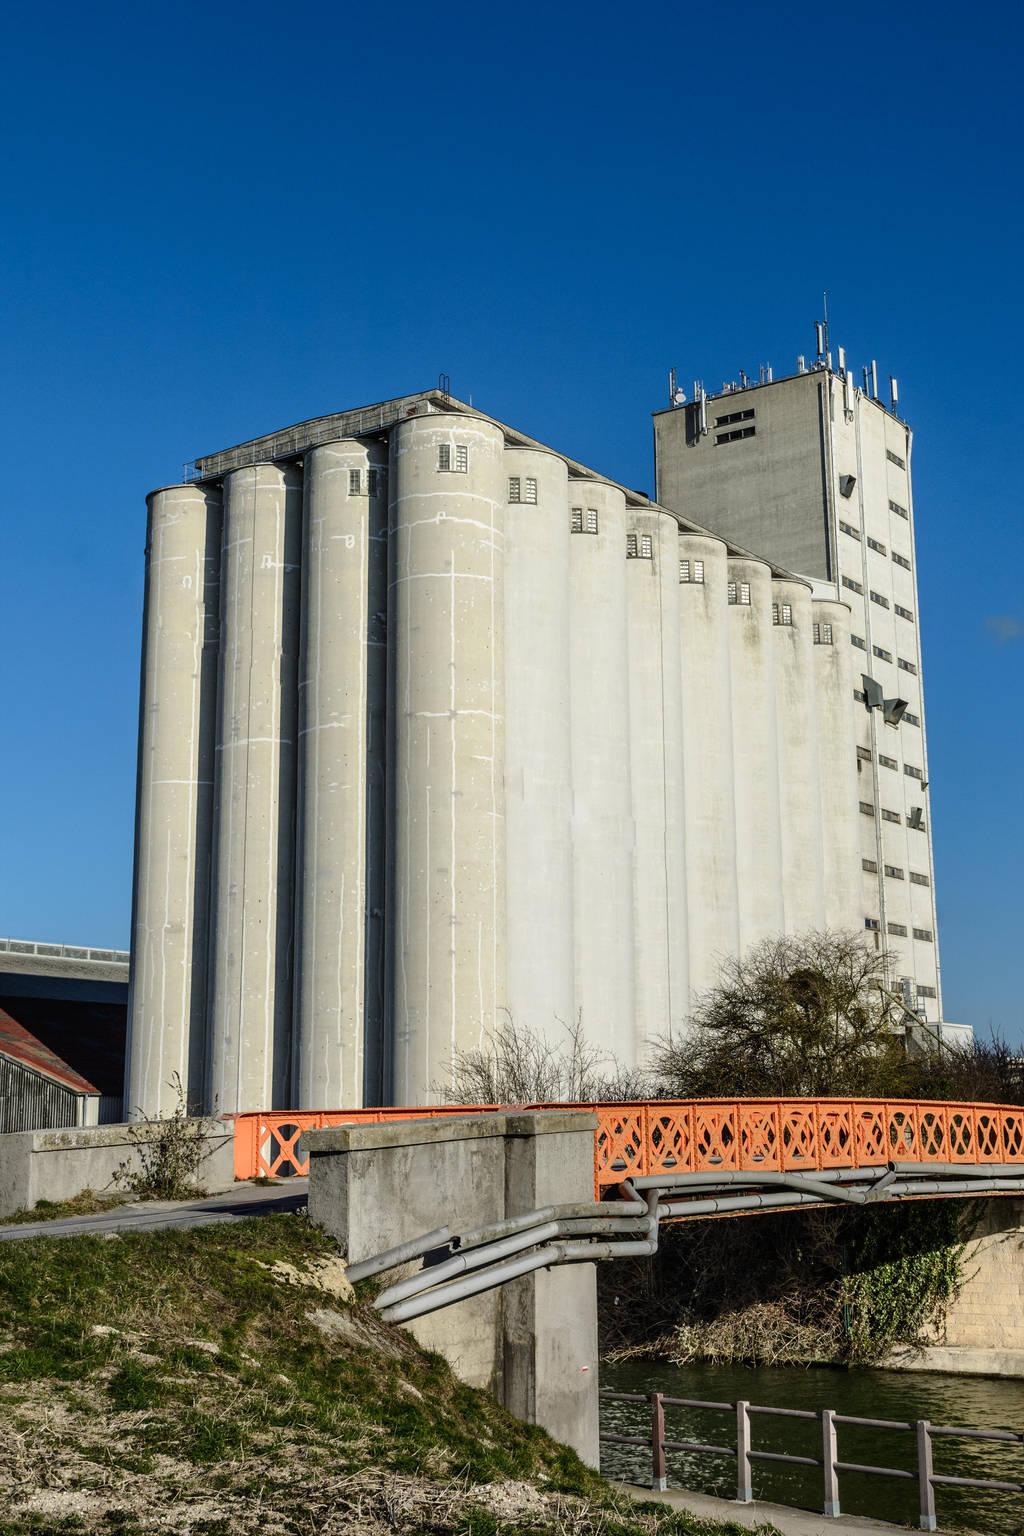 17 Fevrier : Silo agricole by InterludePhoto